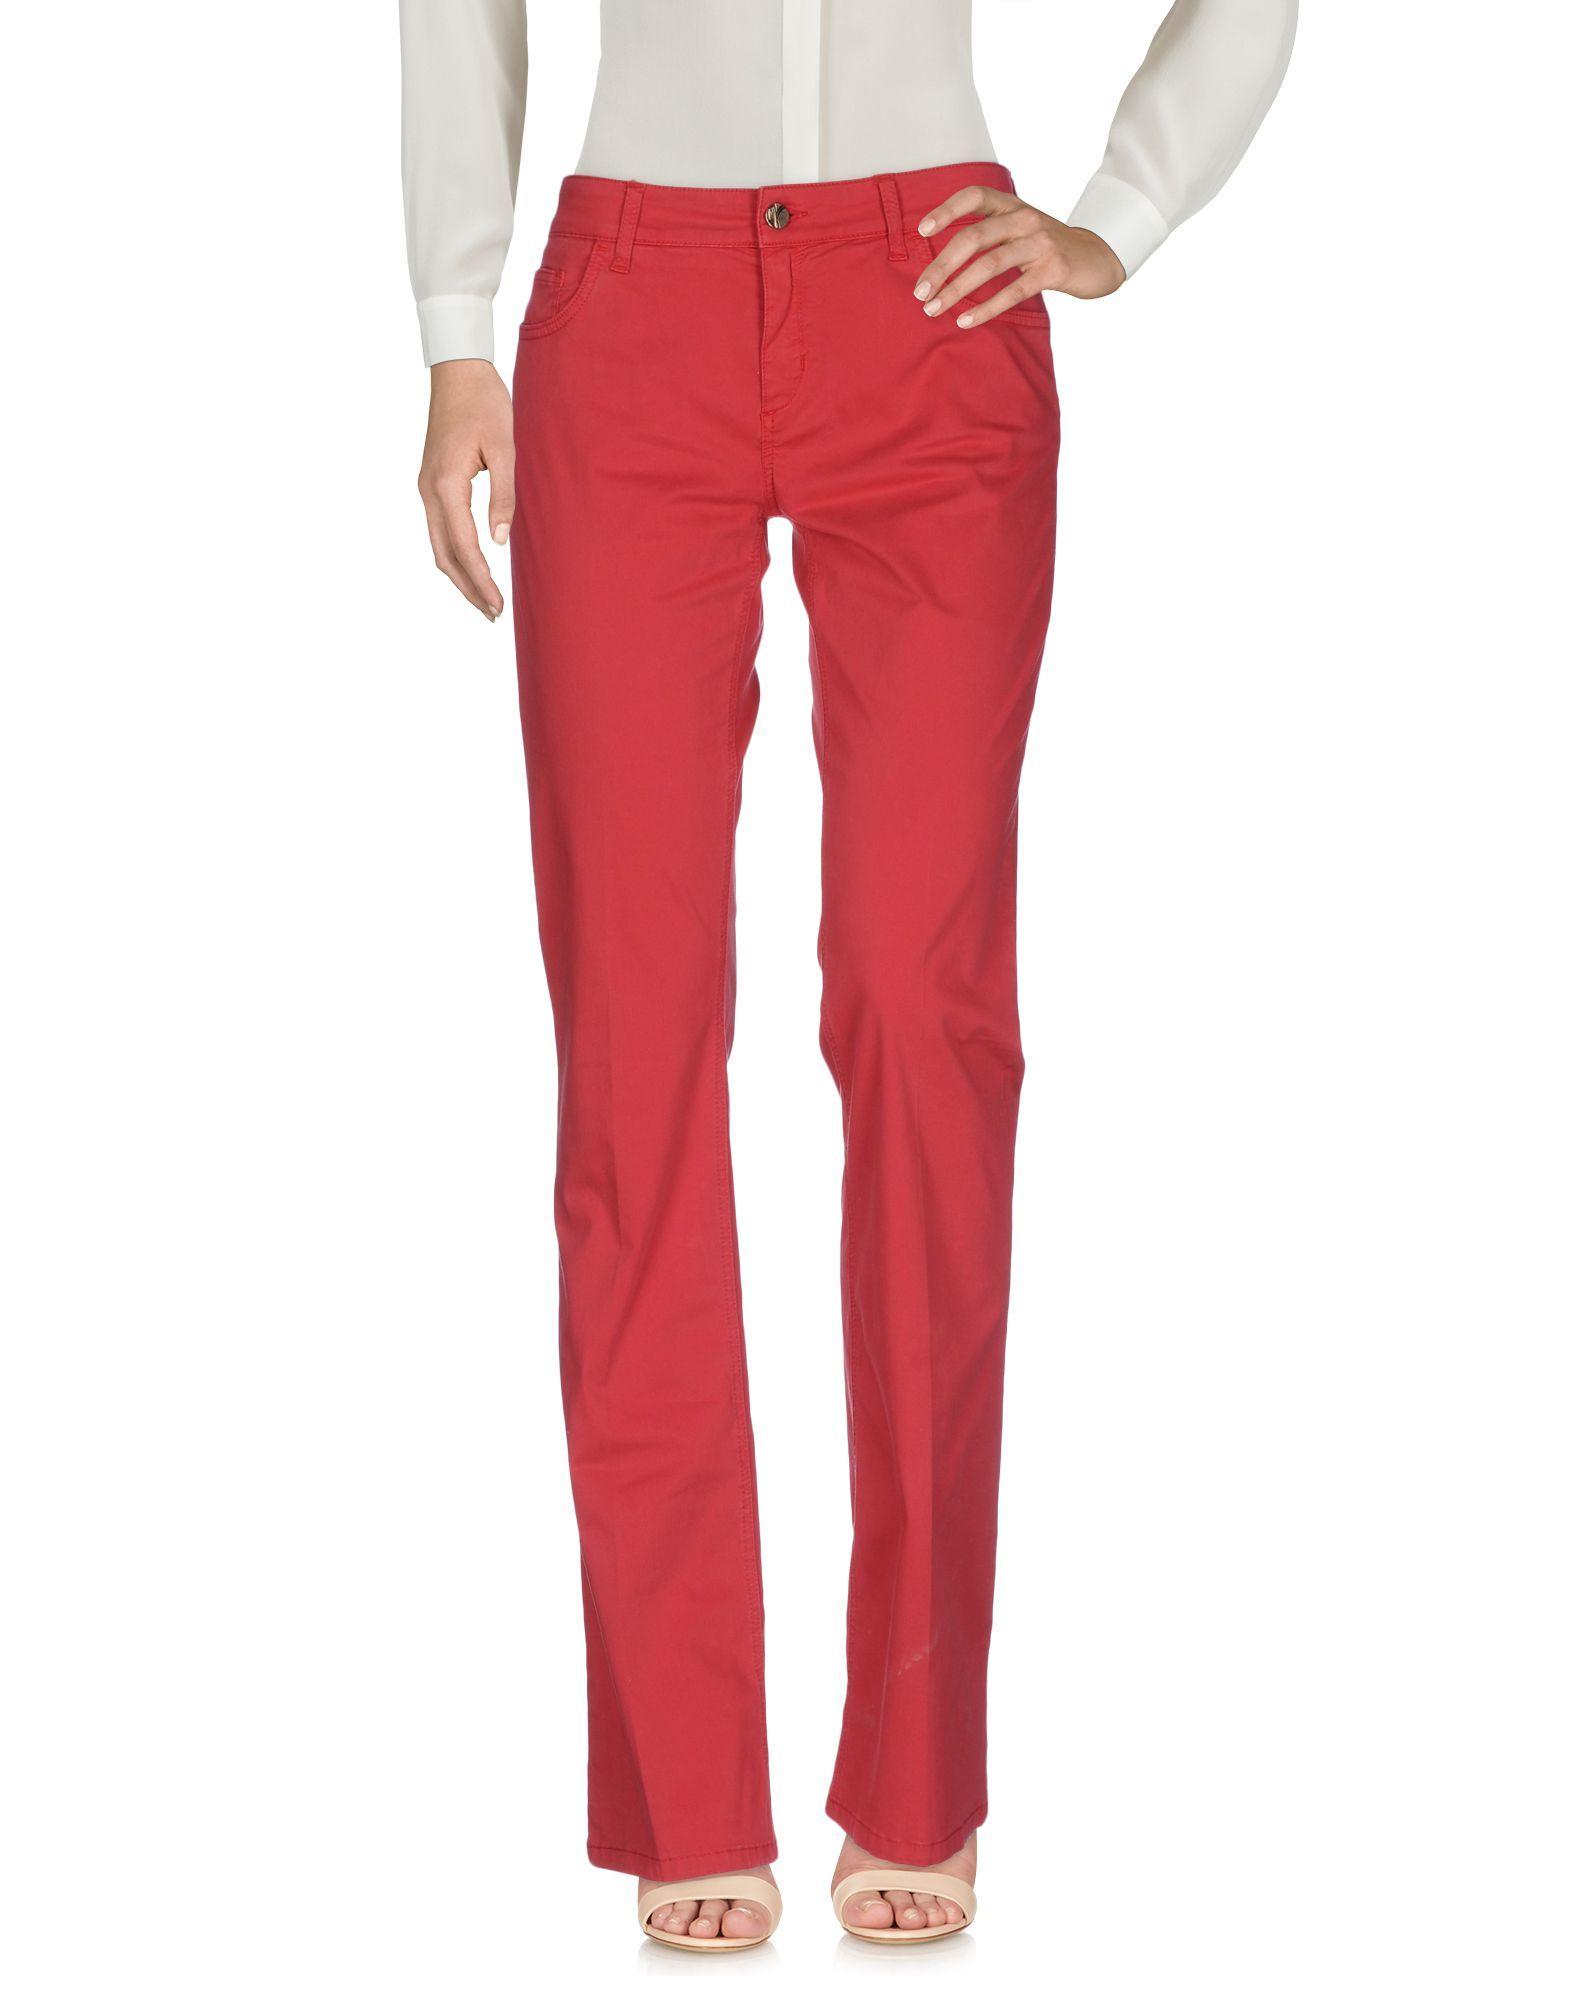 Manila Grace Denim Red Cotton Flare Trousers